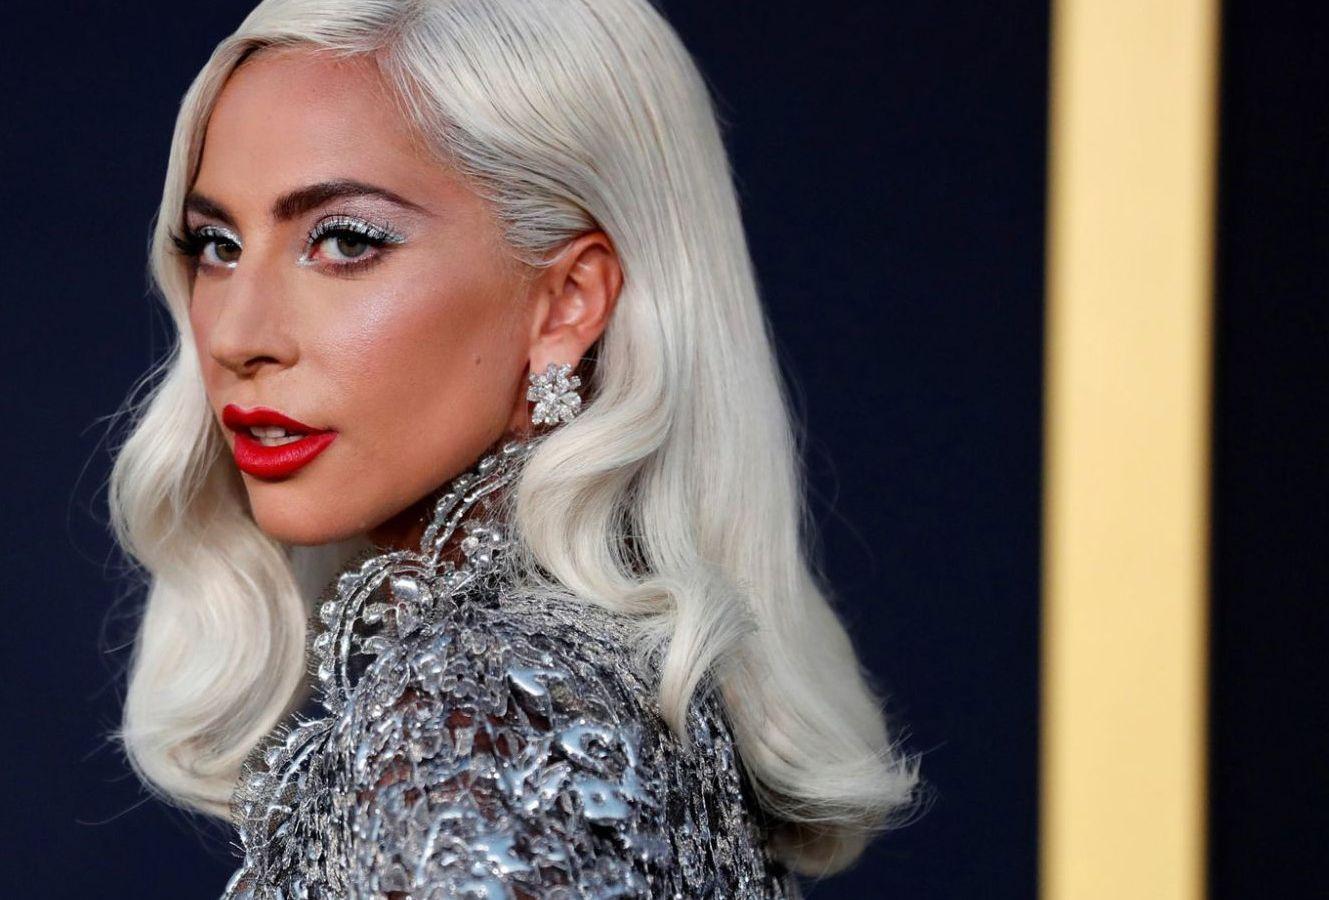 Lady Gaga: Οι στιλιστικές επιλογές της στην σκηνή αξίζουν μια θέση στην ιστορία της μόδας [pics]